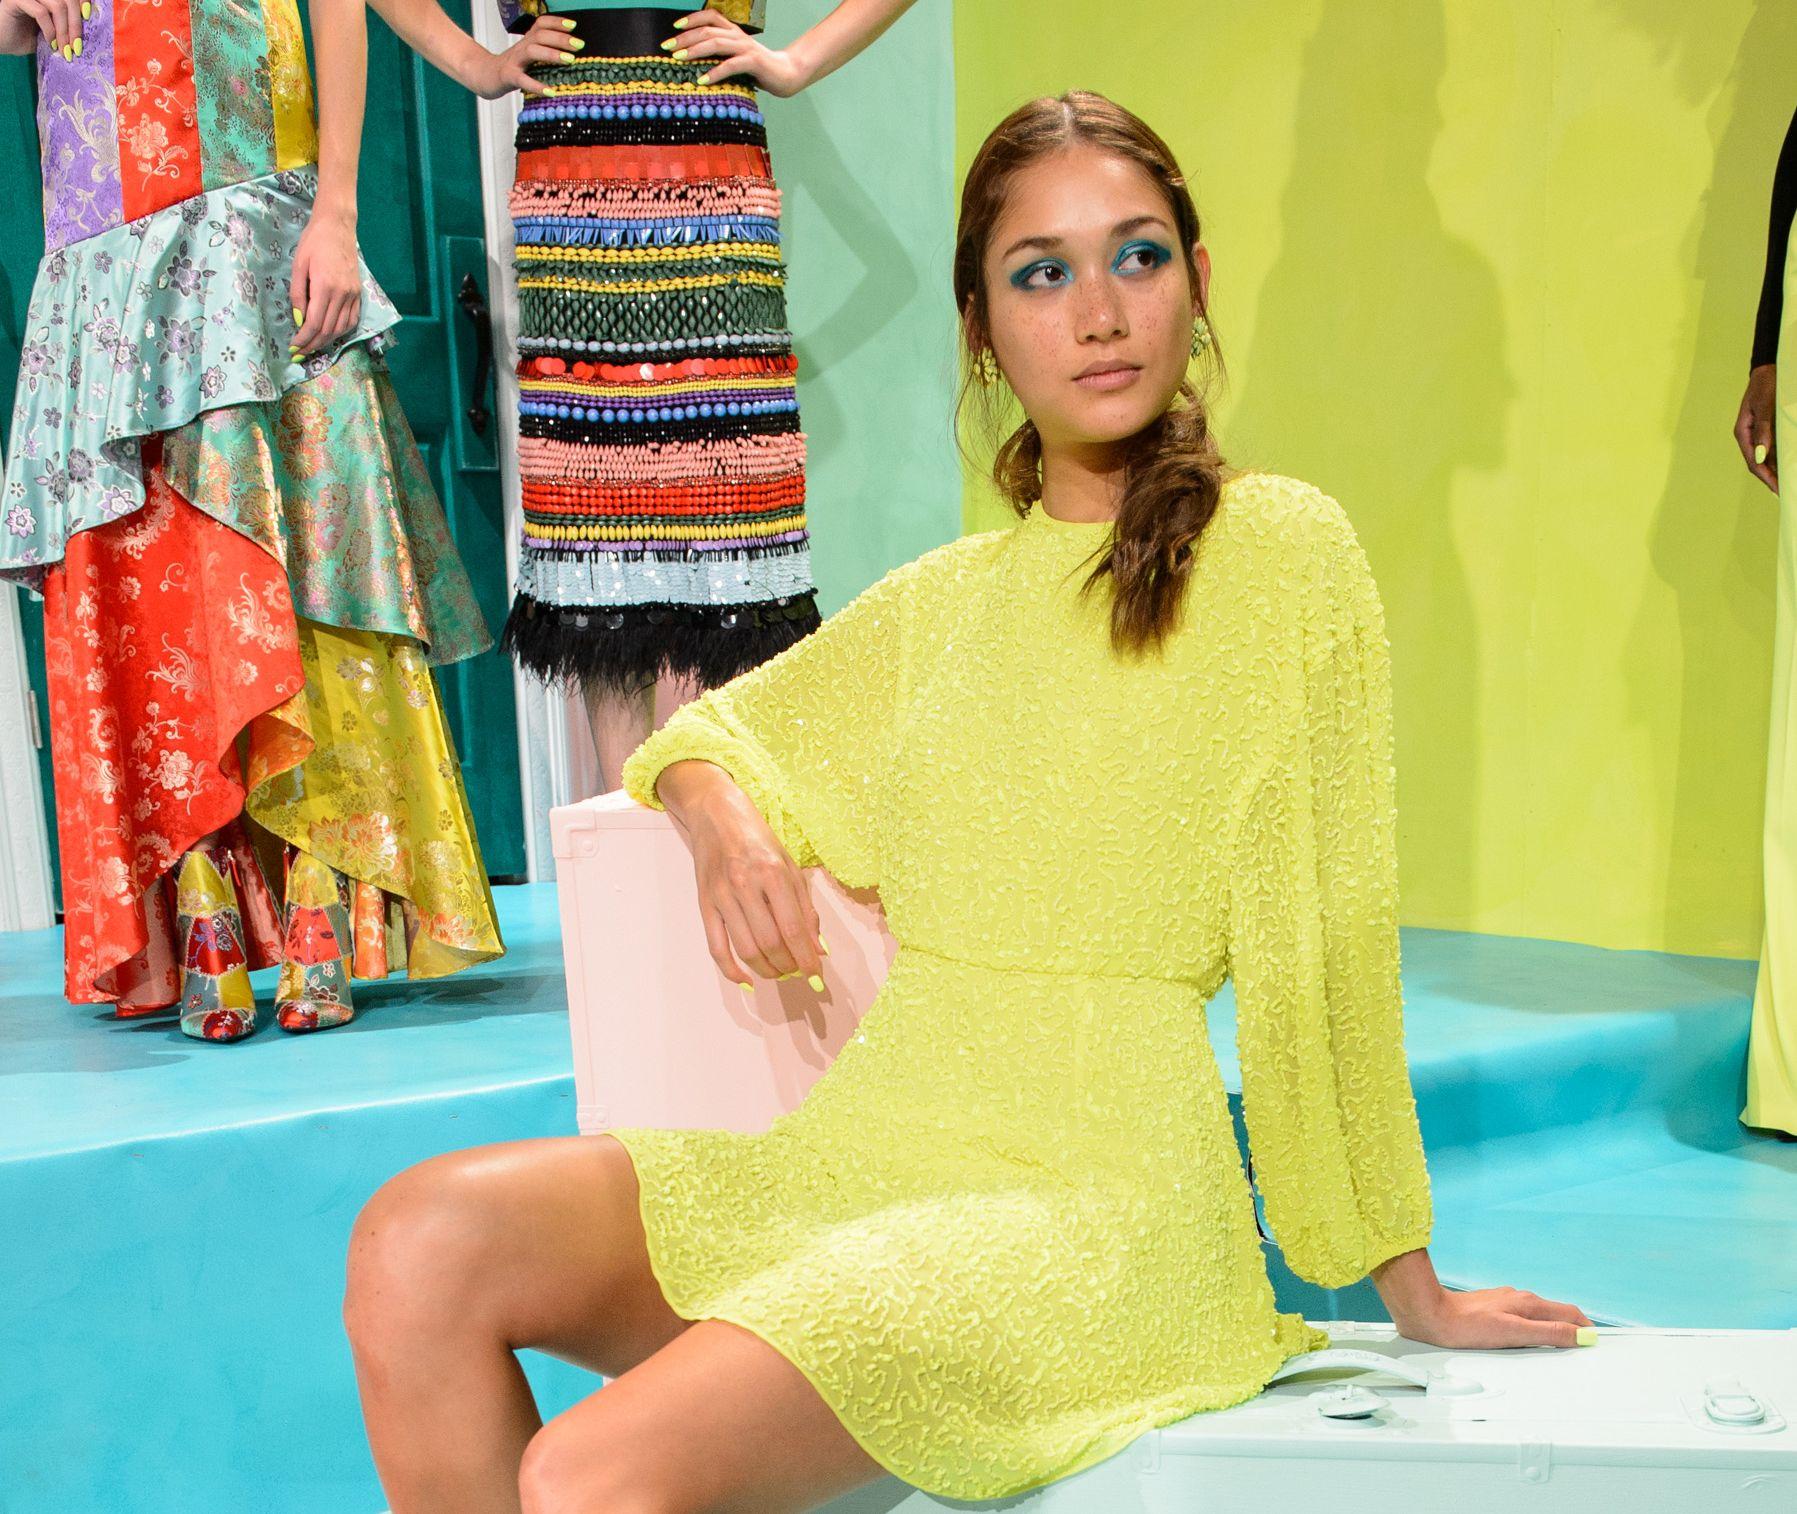 43f704faf6 Modne sukienki  trendy wiosna-lato 2019  - Elle.pl - trendy wiosna lato  2019  moda